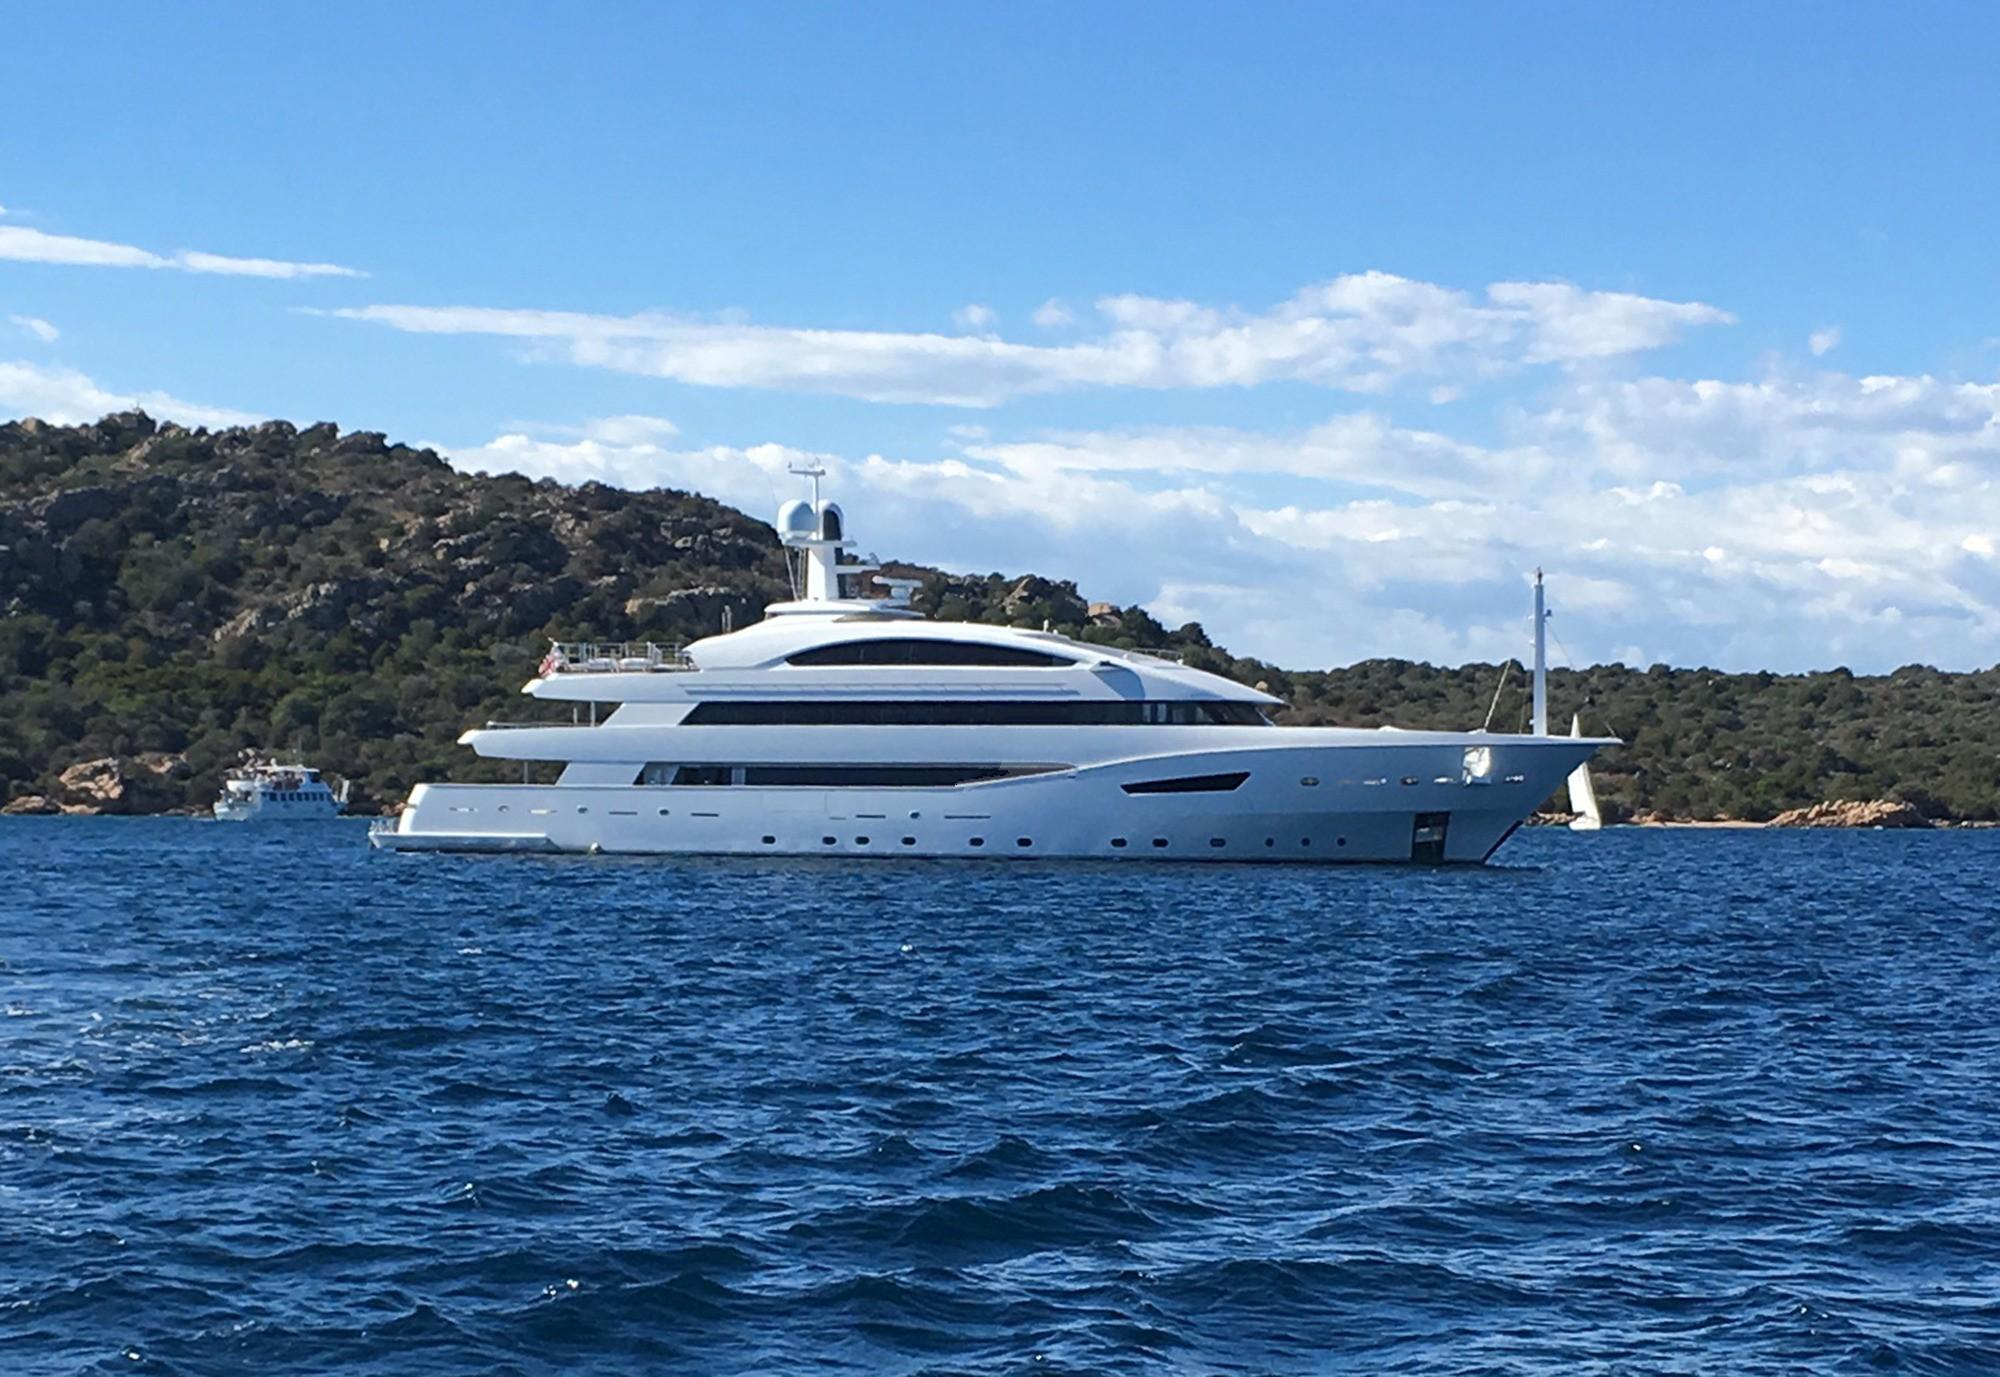 50m Luxury Yacht Profile Photo